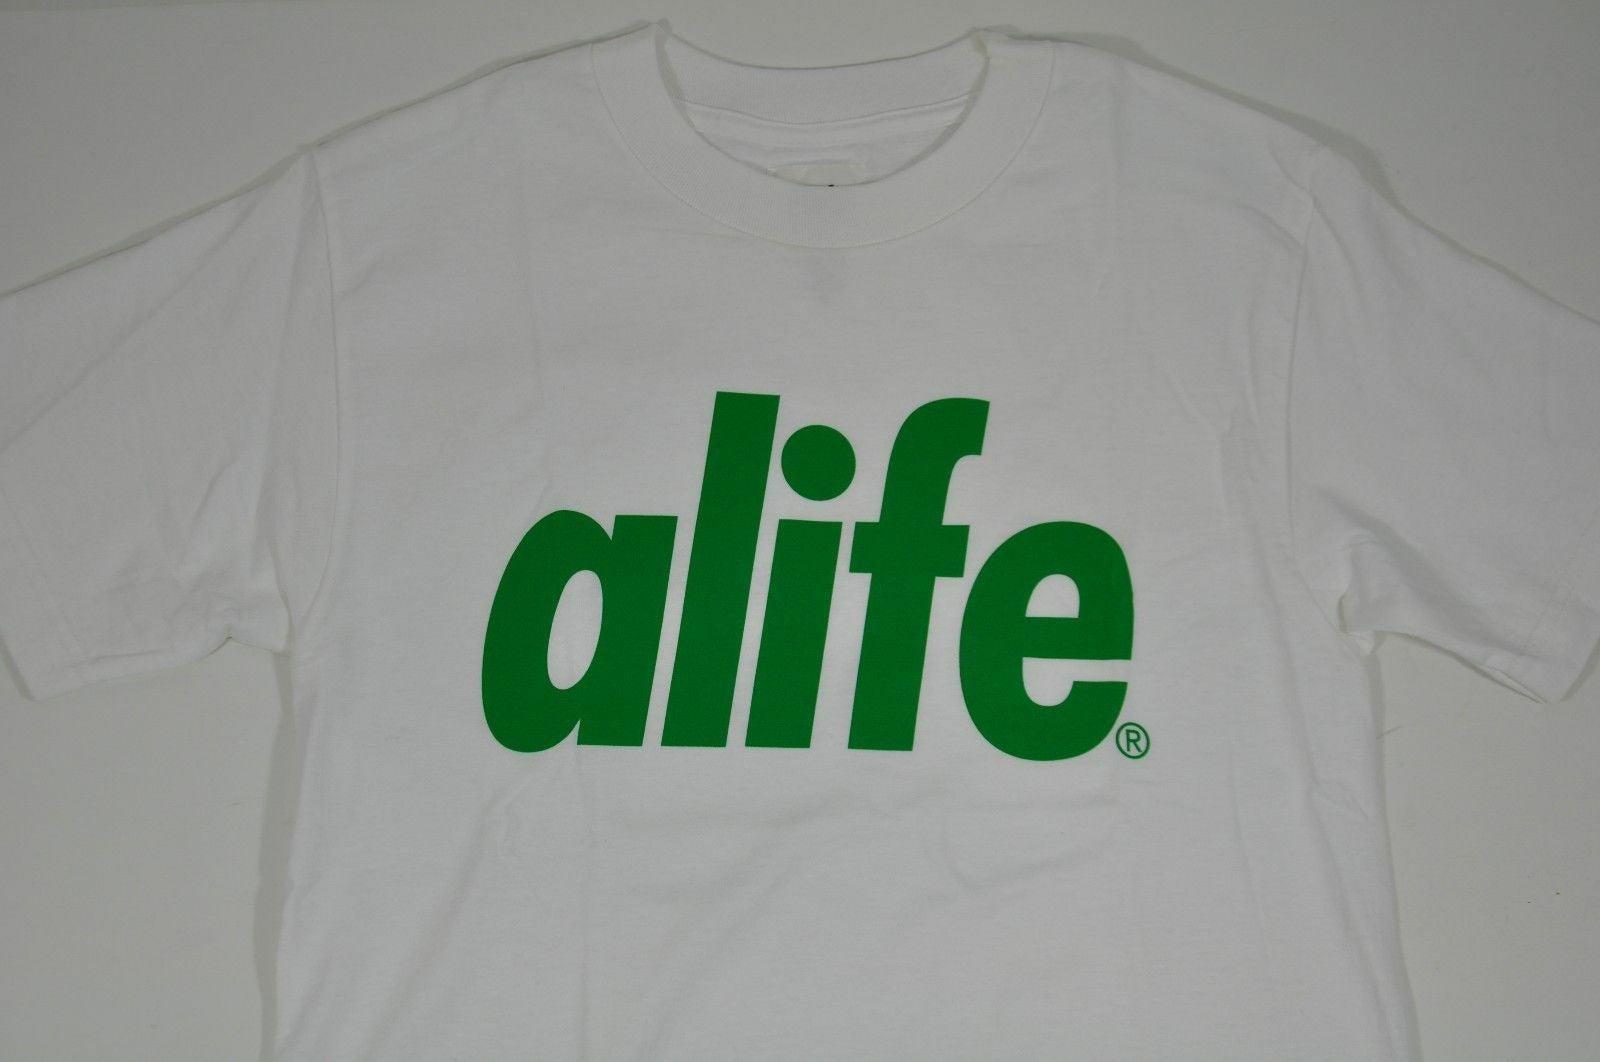 ALIFE Original Tee T Shirt